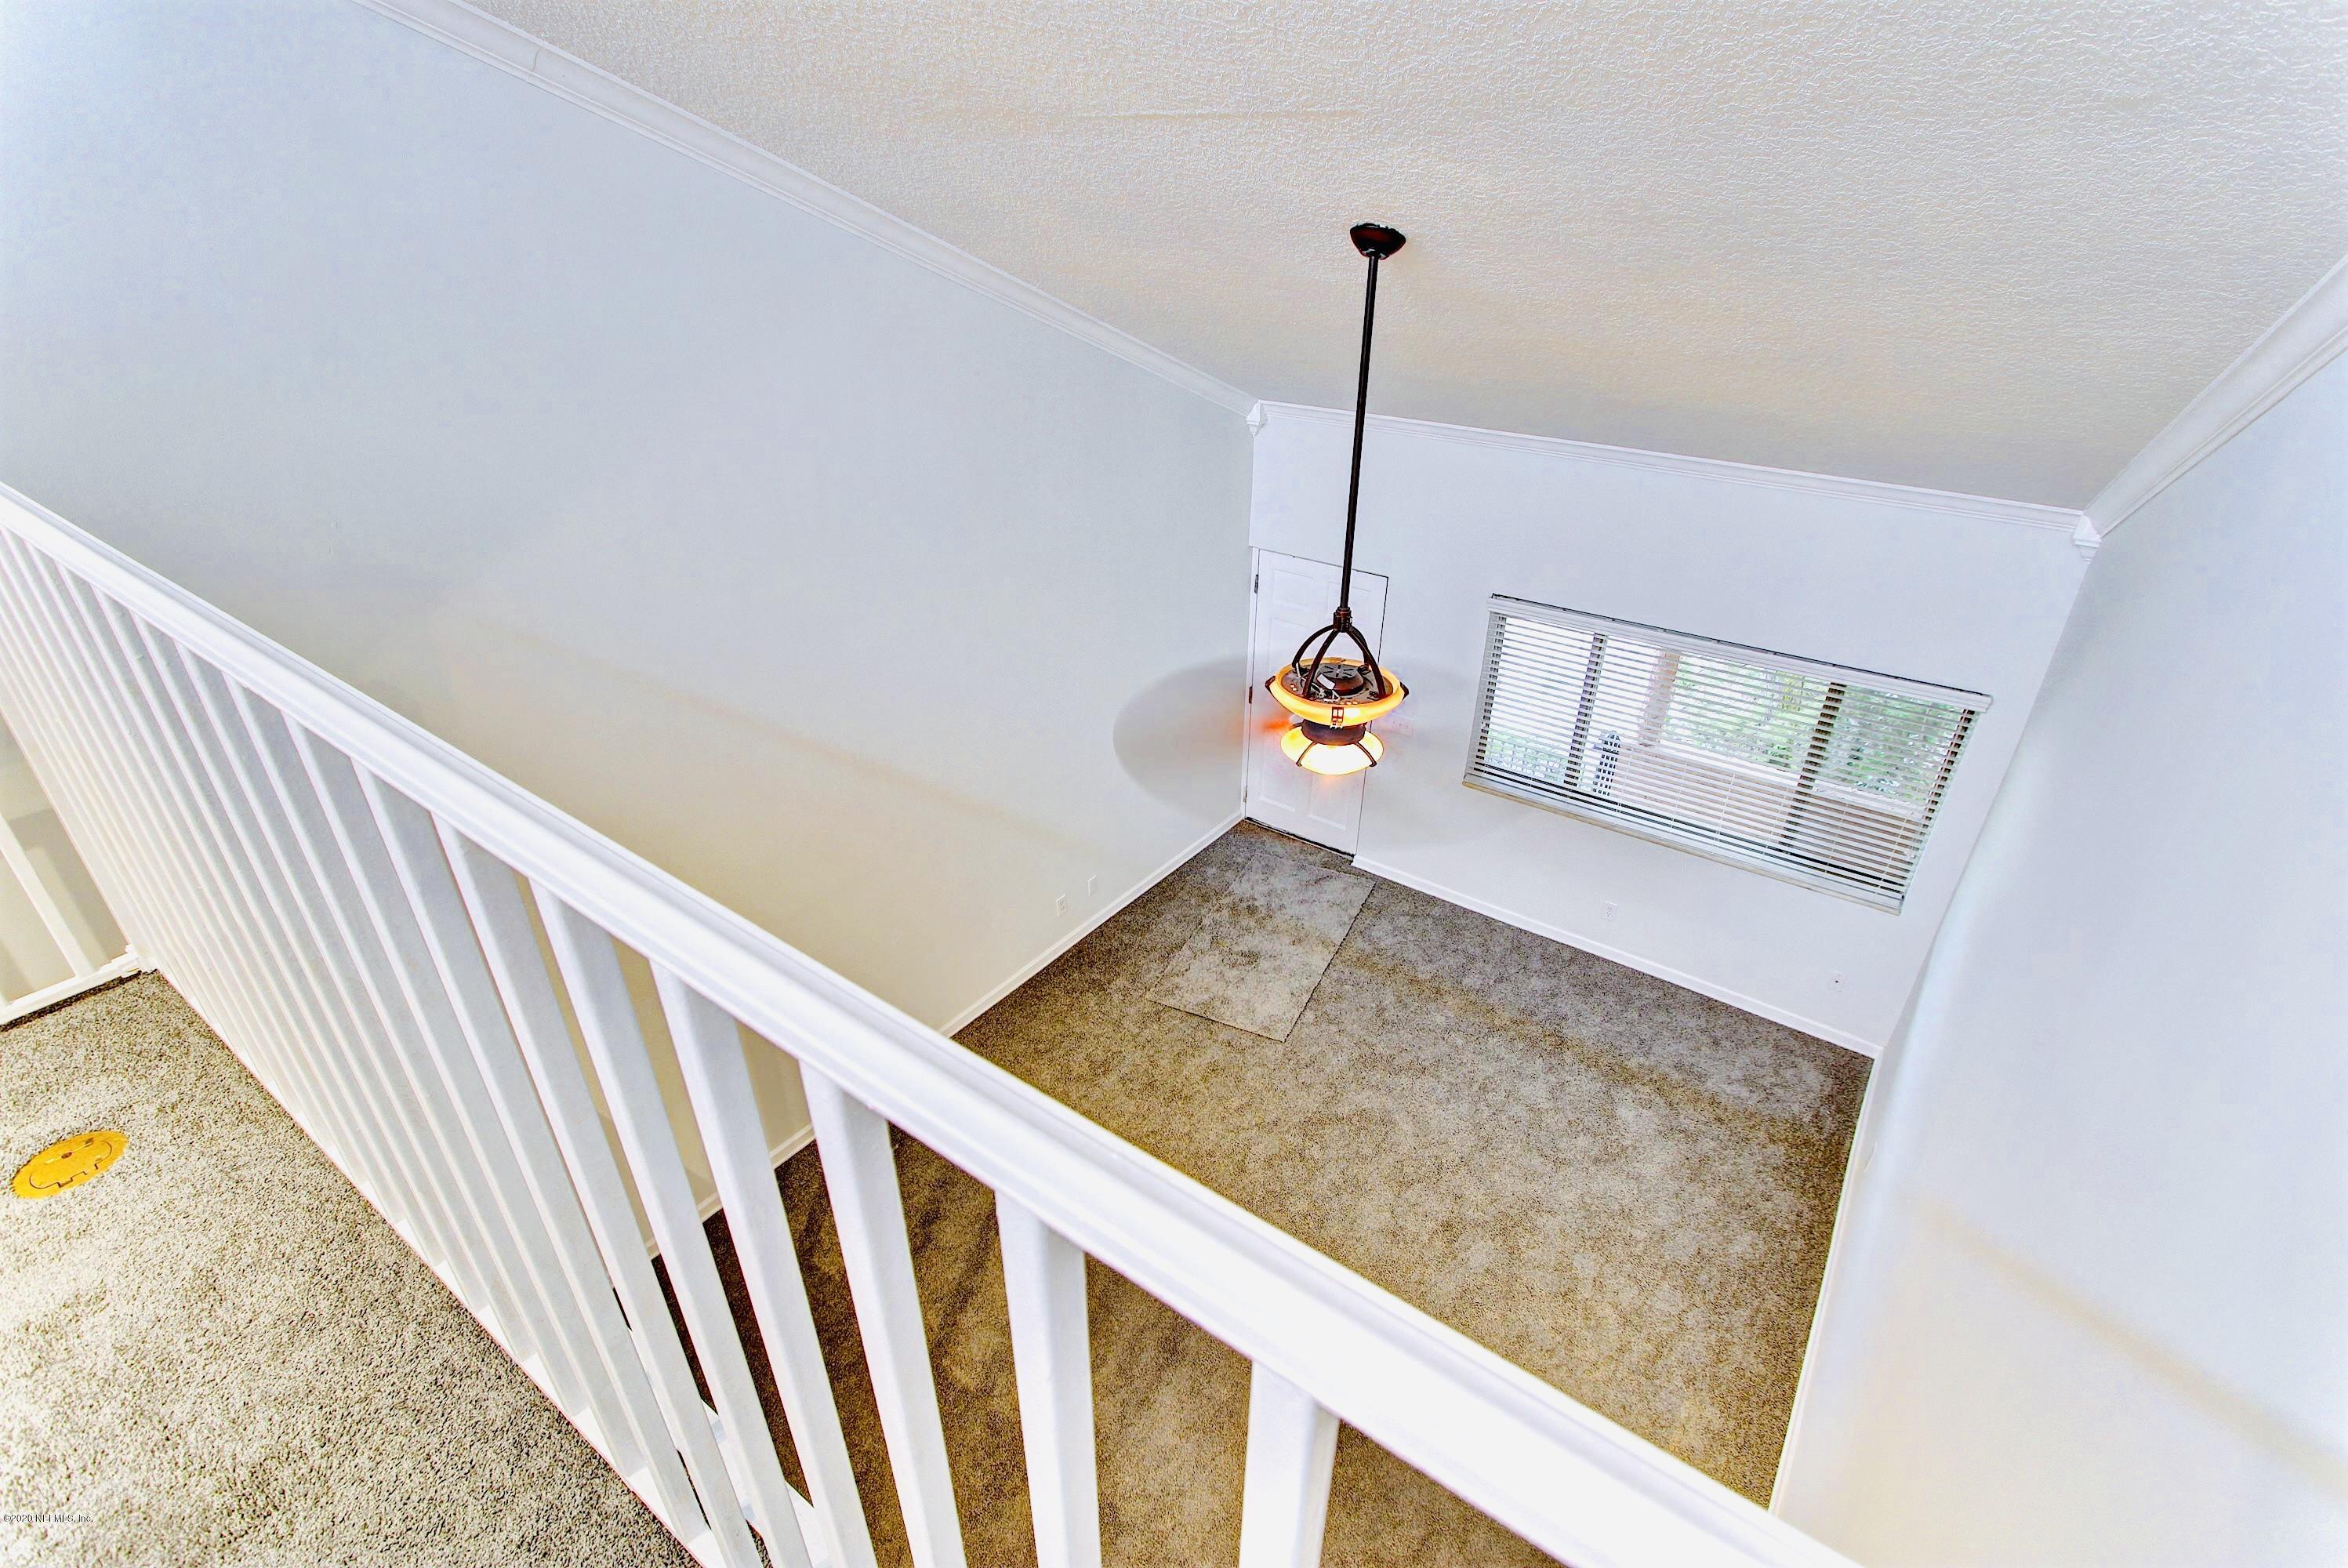 5375 ORTEGA FARMS, JACKSONVILLE, FLORIDA 32210, 2 Bedrooms Bedrooms, ,2 BathroomsBathrooms,Residential,For sale,ORTEGA FARMS,1083382